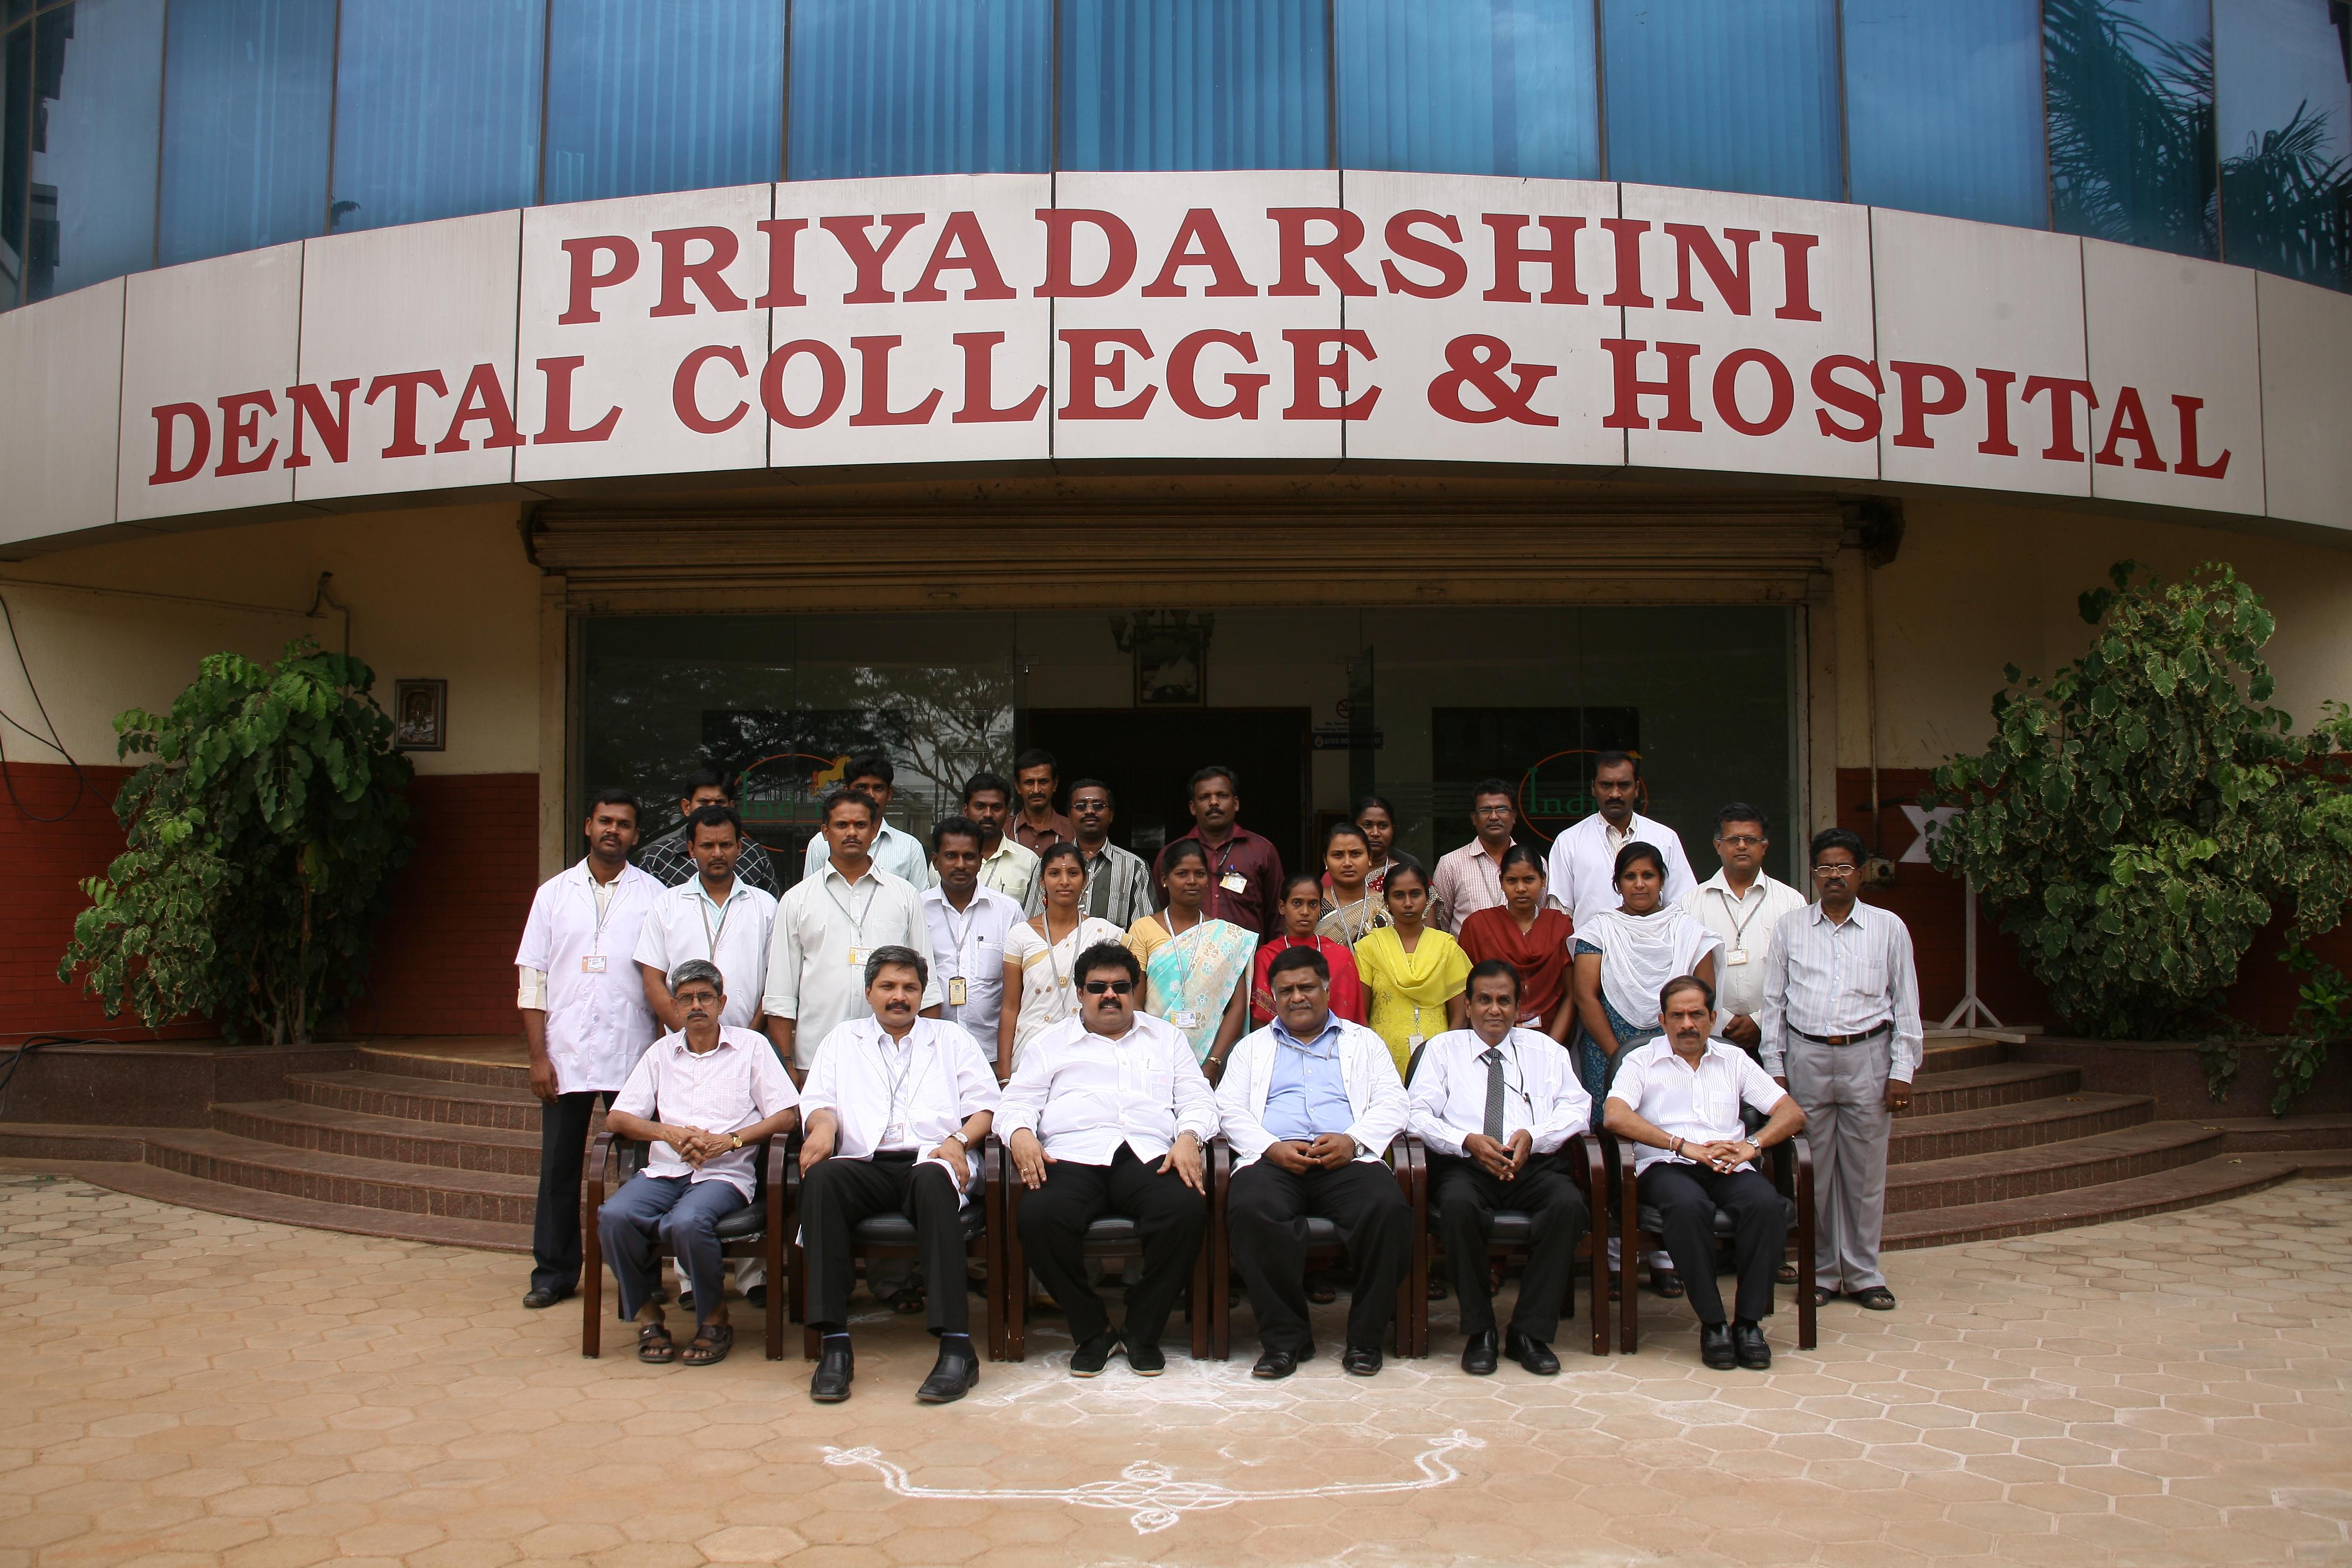 Priyadarshini Dental College and Hospital, Tiruvallur